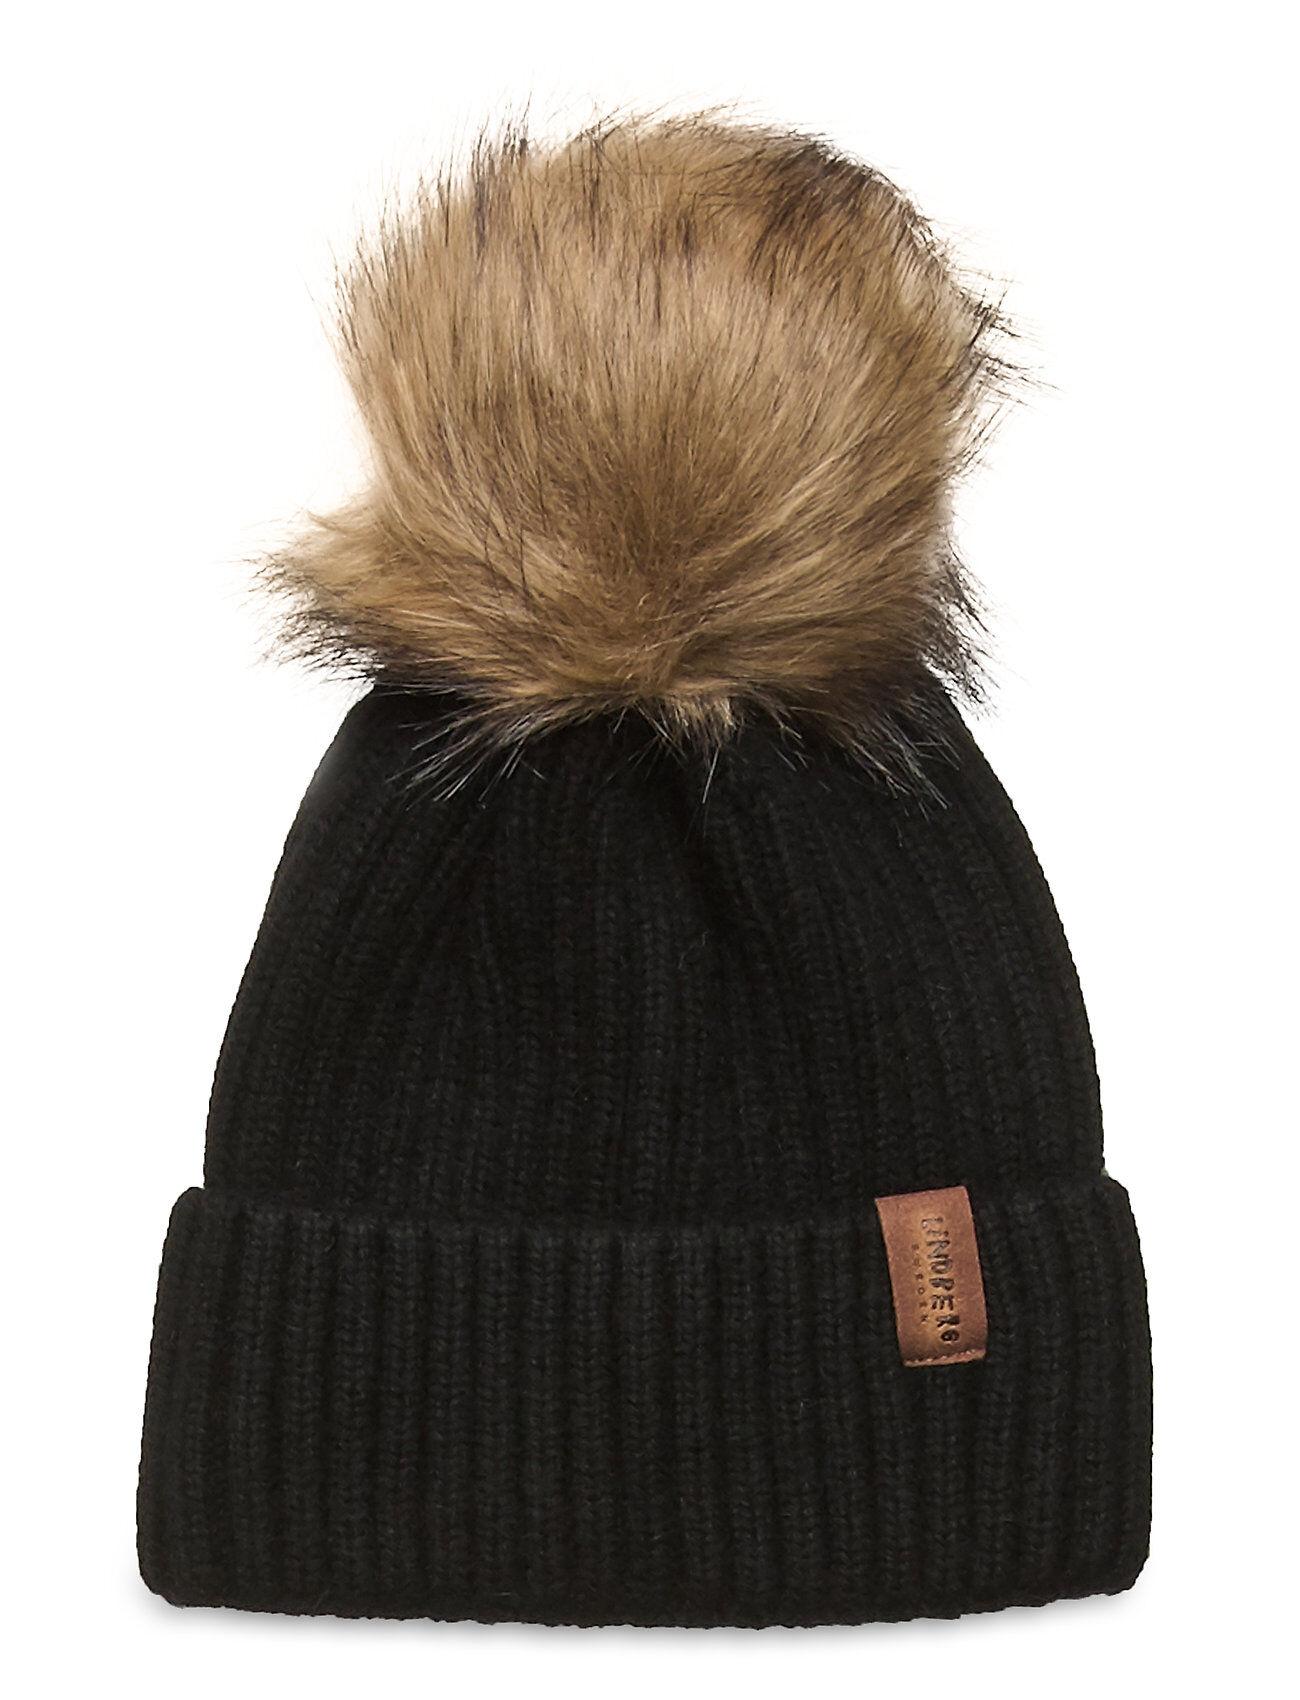 Lindberg Sweden Sibo Hat Accessories Headwear Hats Musta Lindberg Sweden